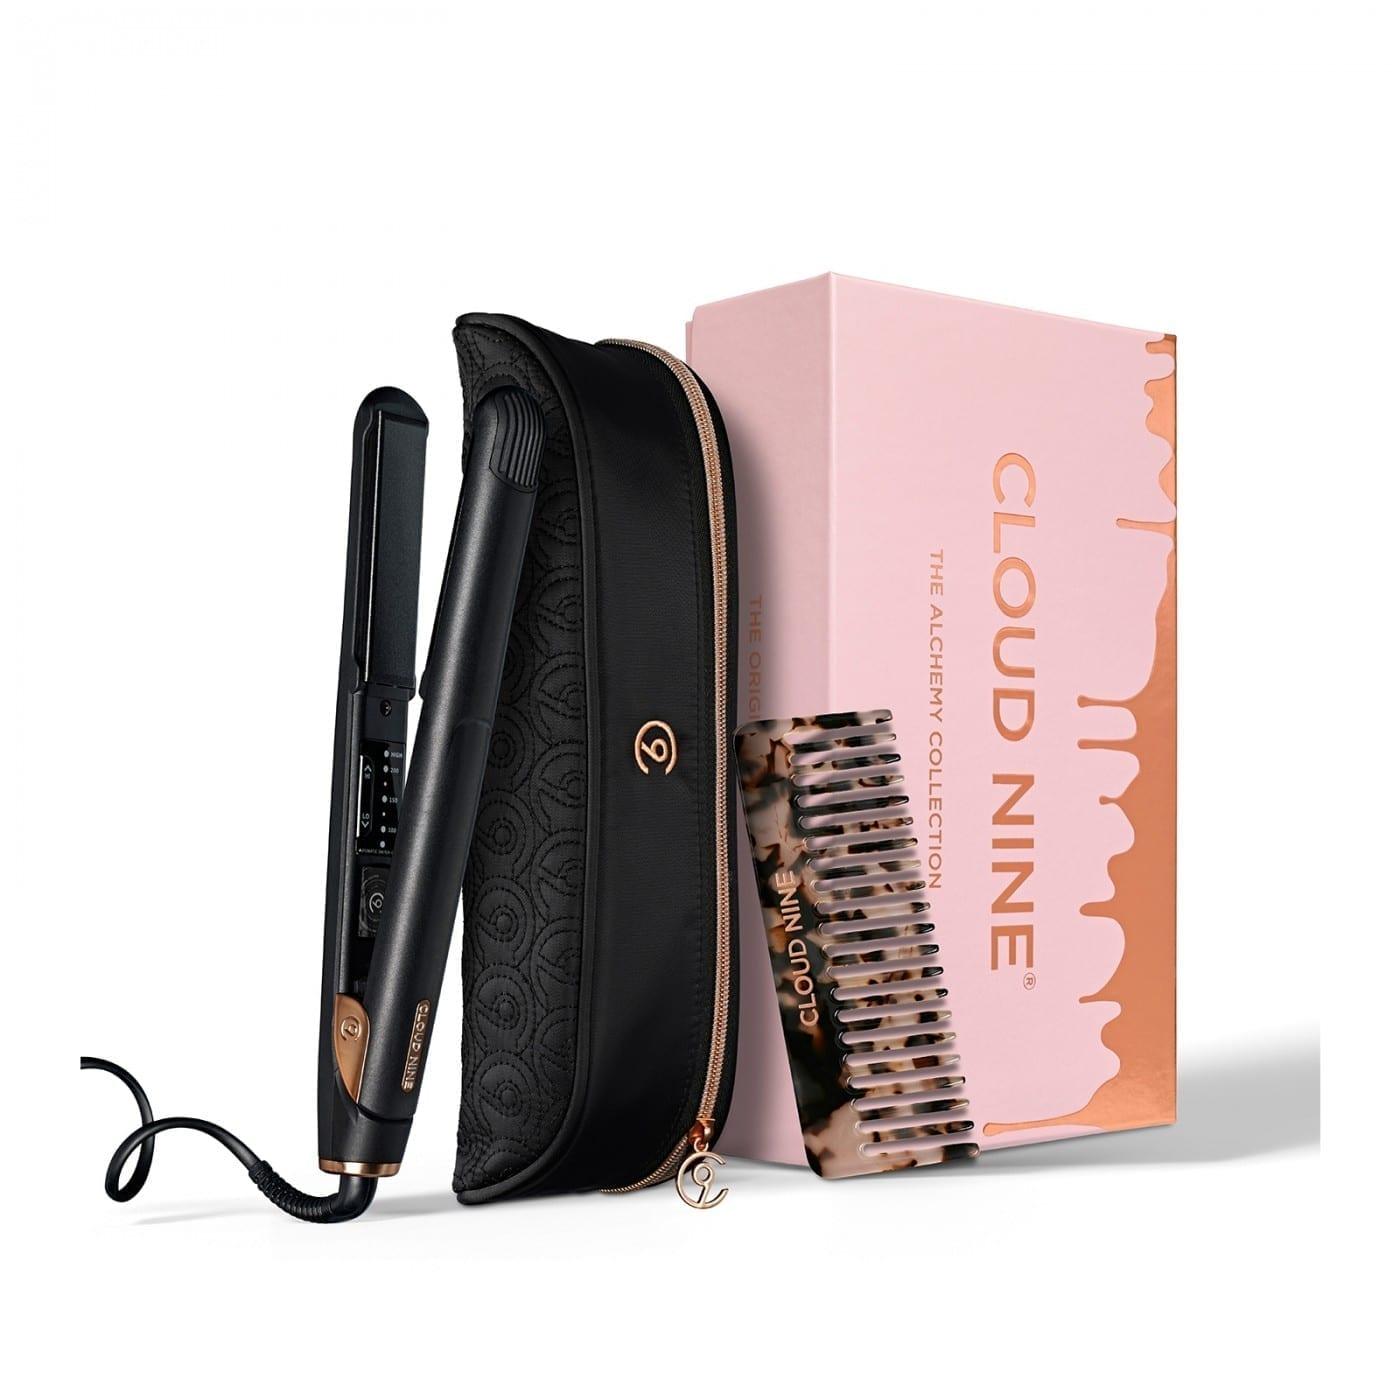 Cloud Nine The Original Iron Alchemy Gift Set 2019 + FREE Luxury Texture Comb